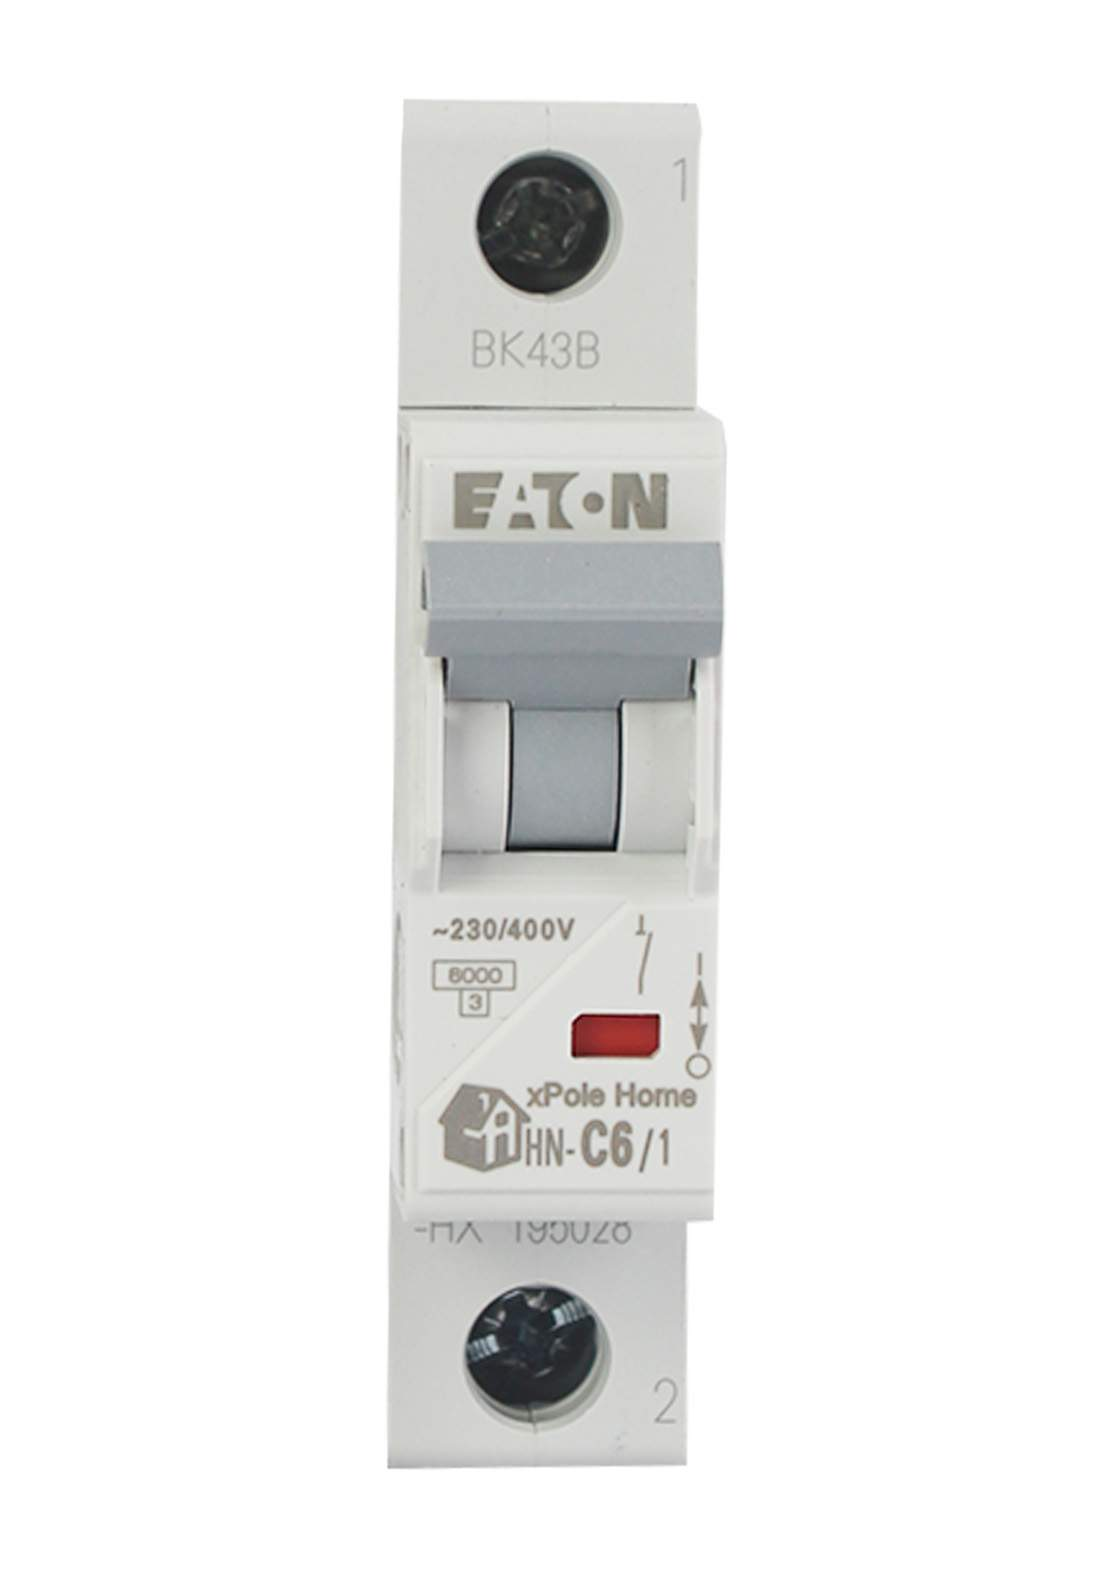 Eaton HN-C6/1-HX Circuit Breaker 6A قاطع تيار الكهرباء (جوزة)